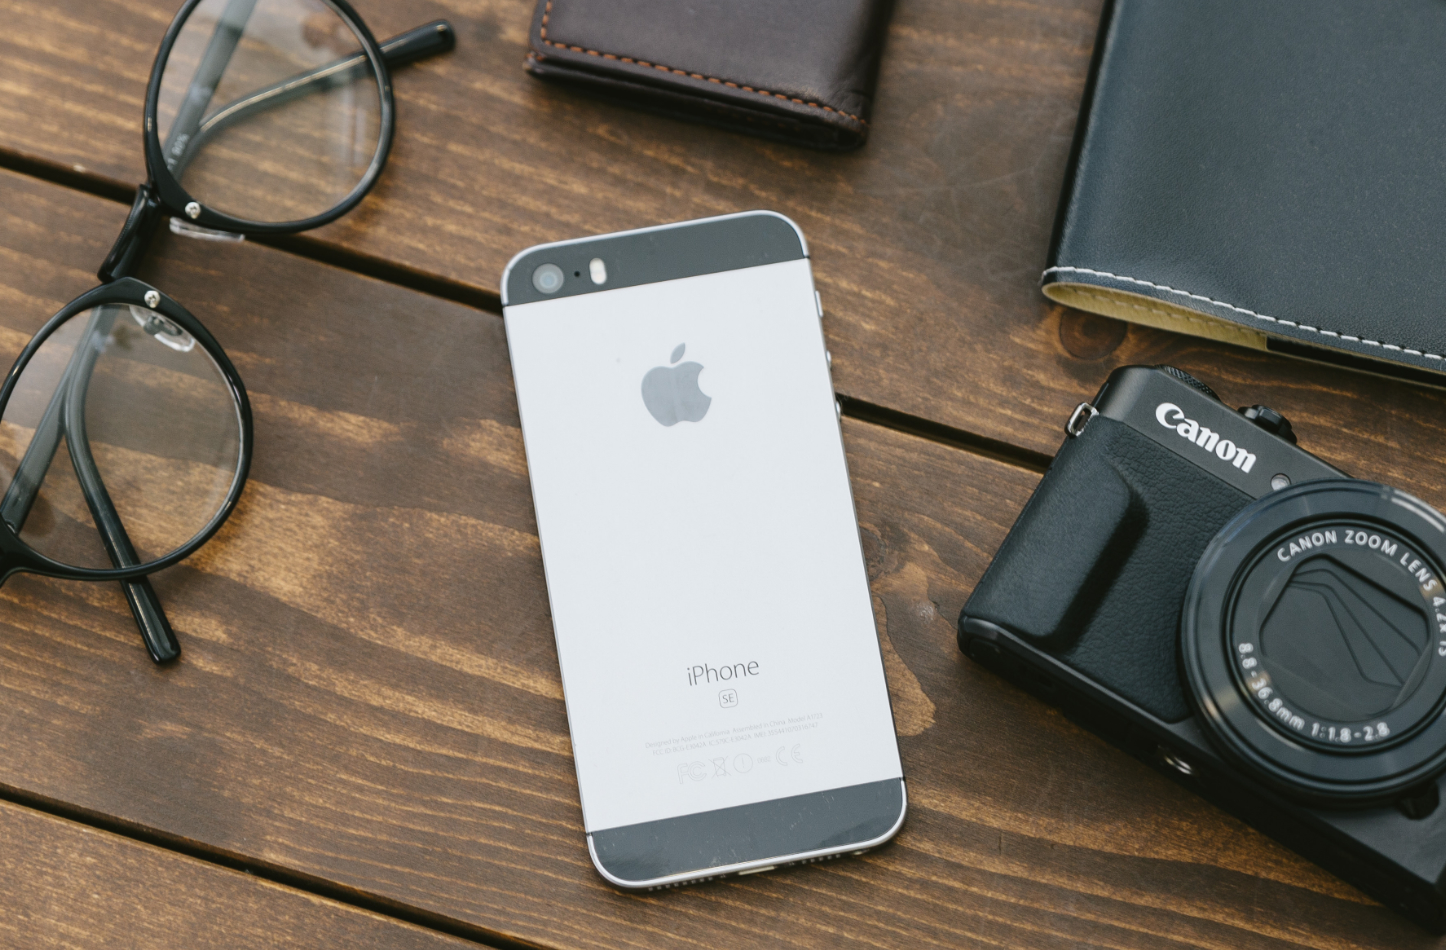 iphone-se-and-camera-glasses-2.jpg